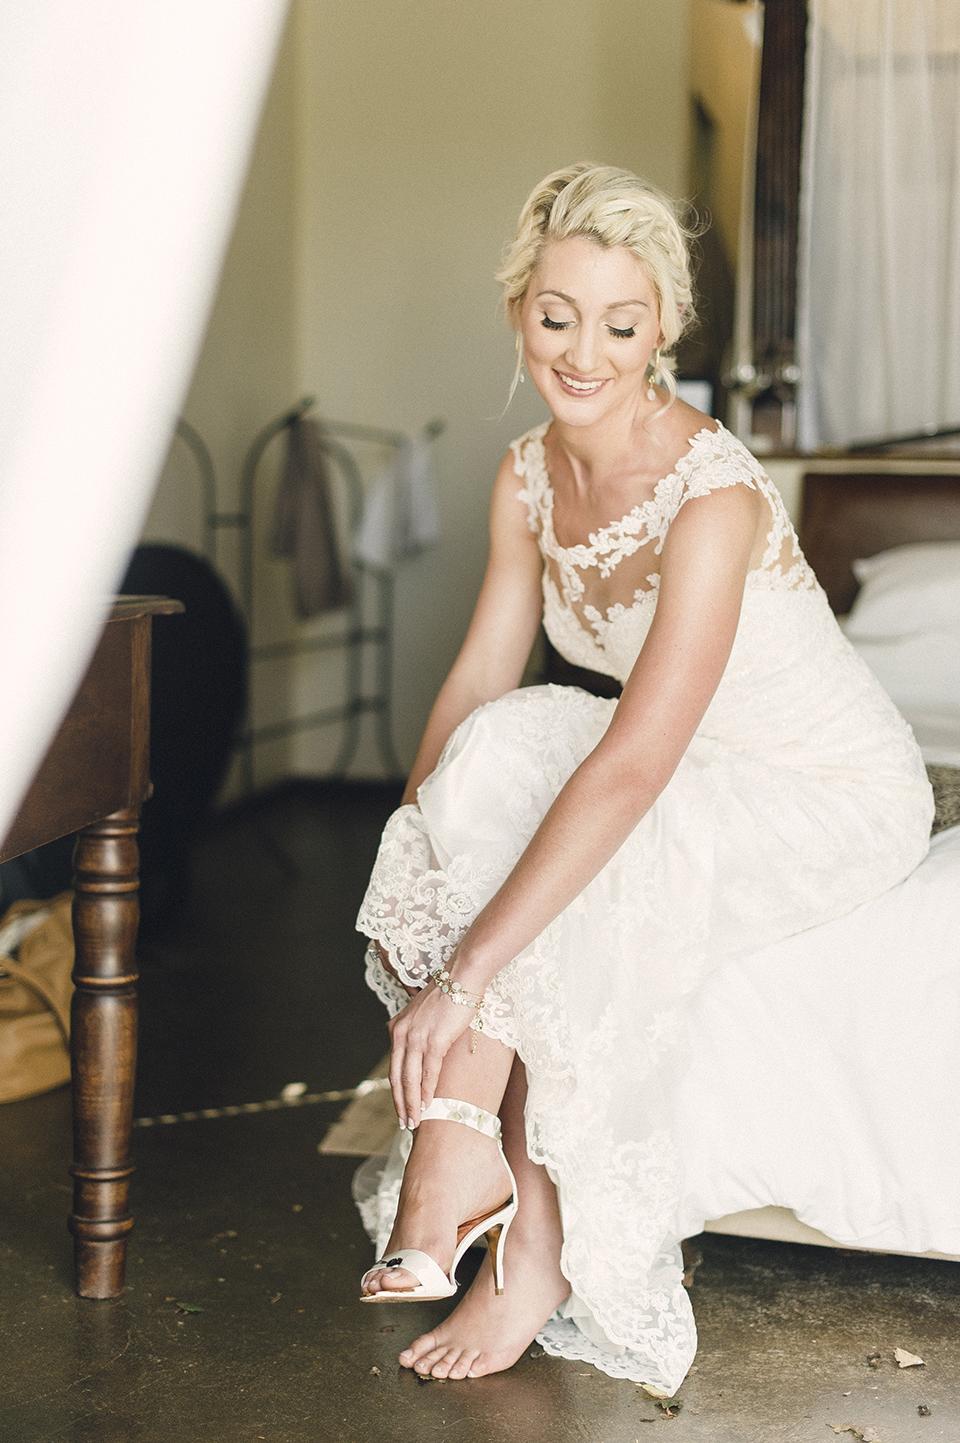 RyanParker_WeddingPhotographer_FineArt_CapeTown_Robertson_PatBusch_Hermanus_M&S_DSC_2909.jpg